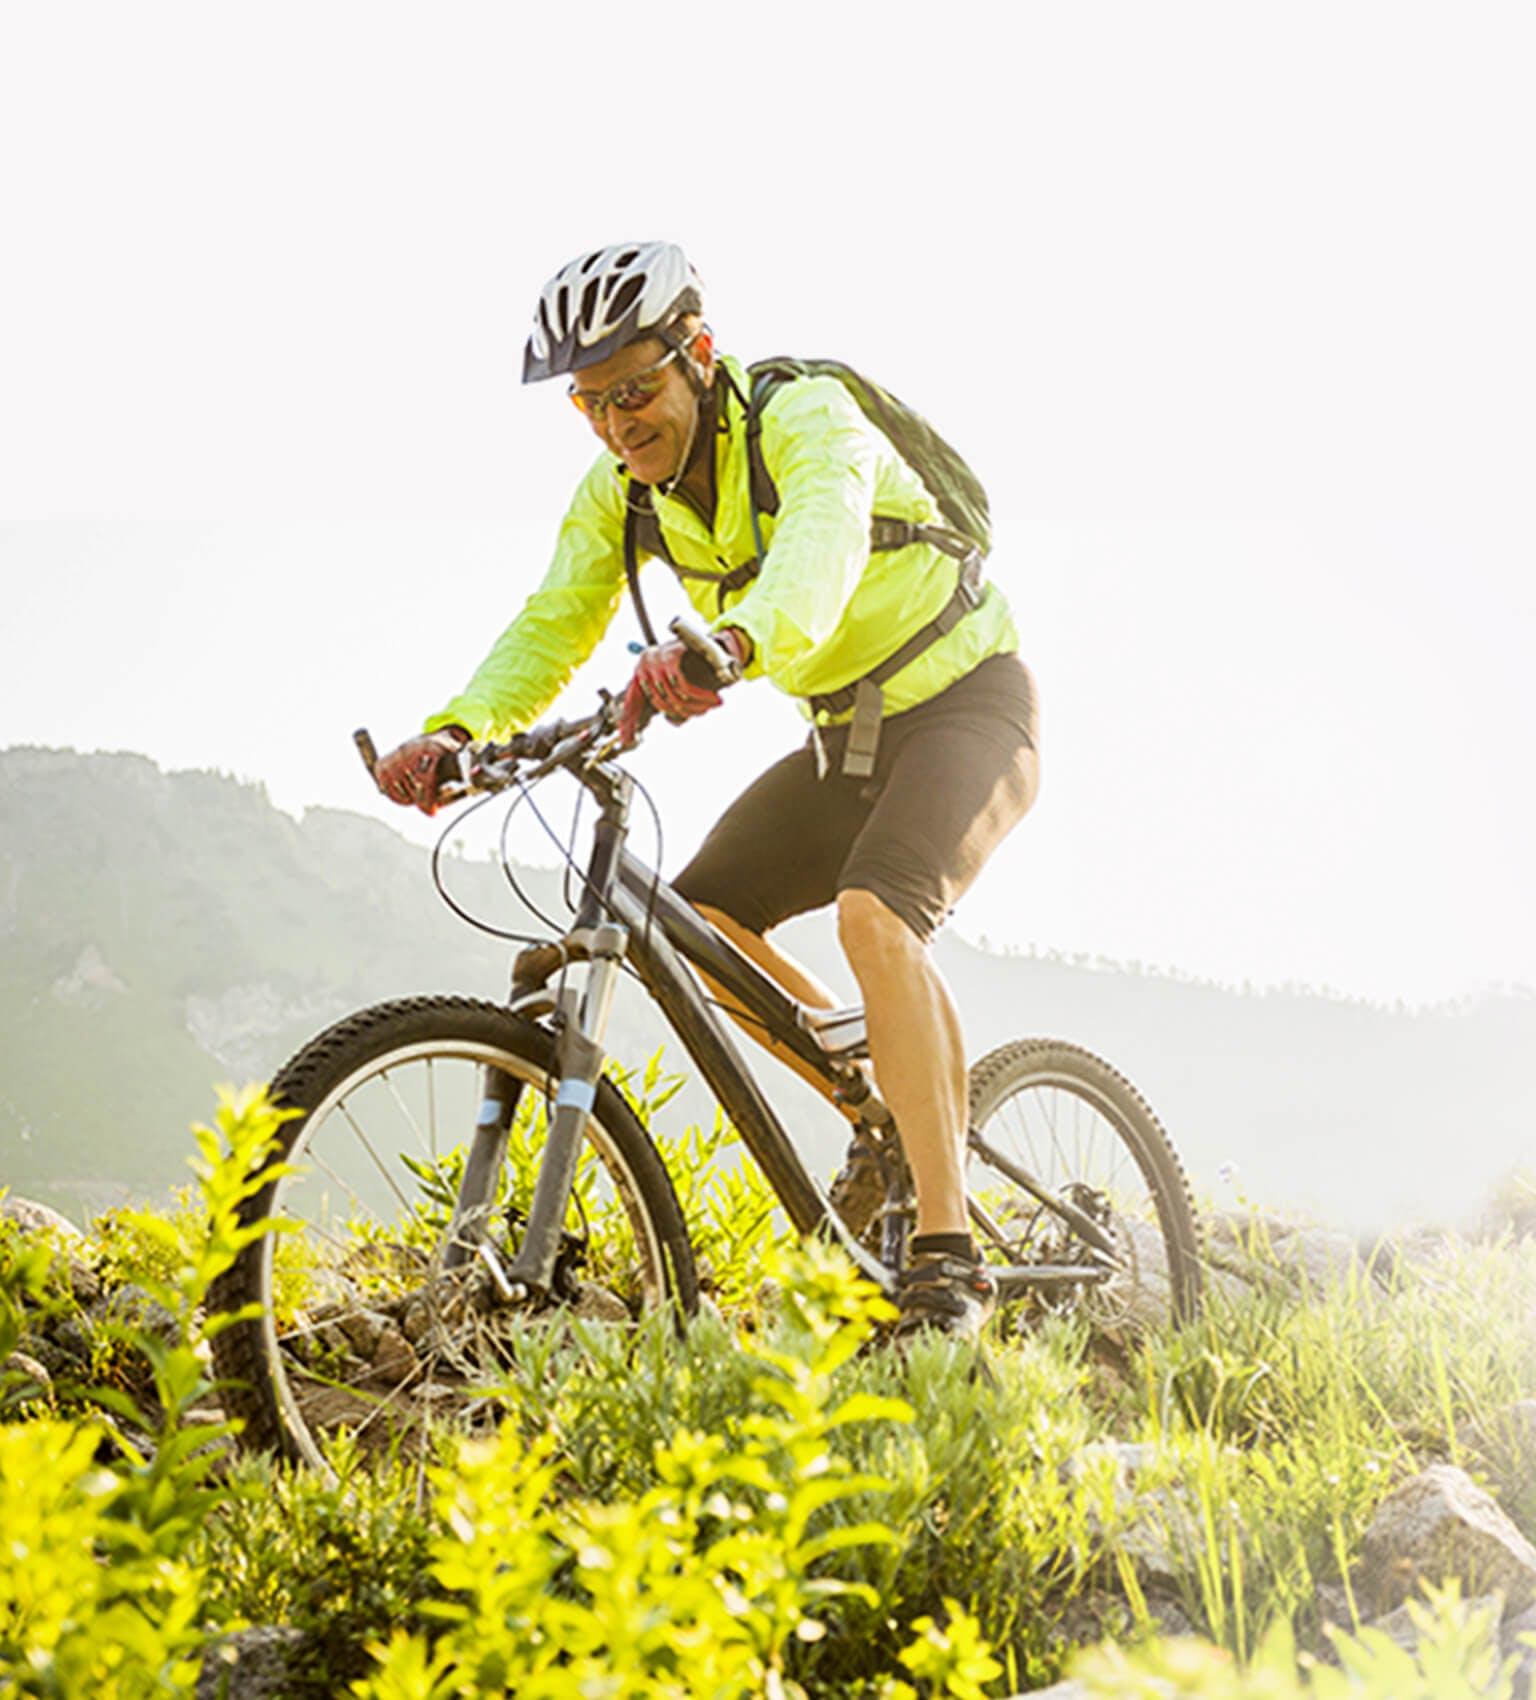 Imagen de ciclista